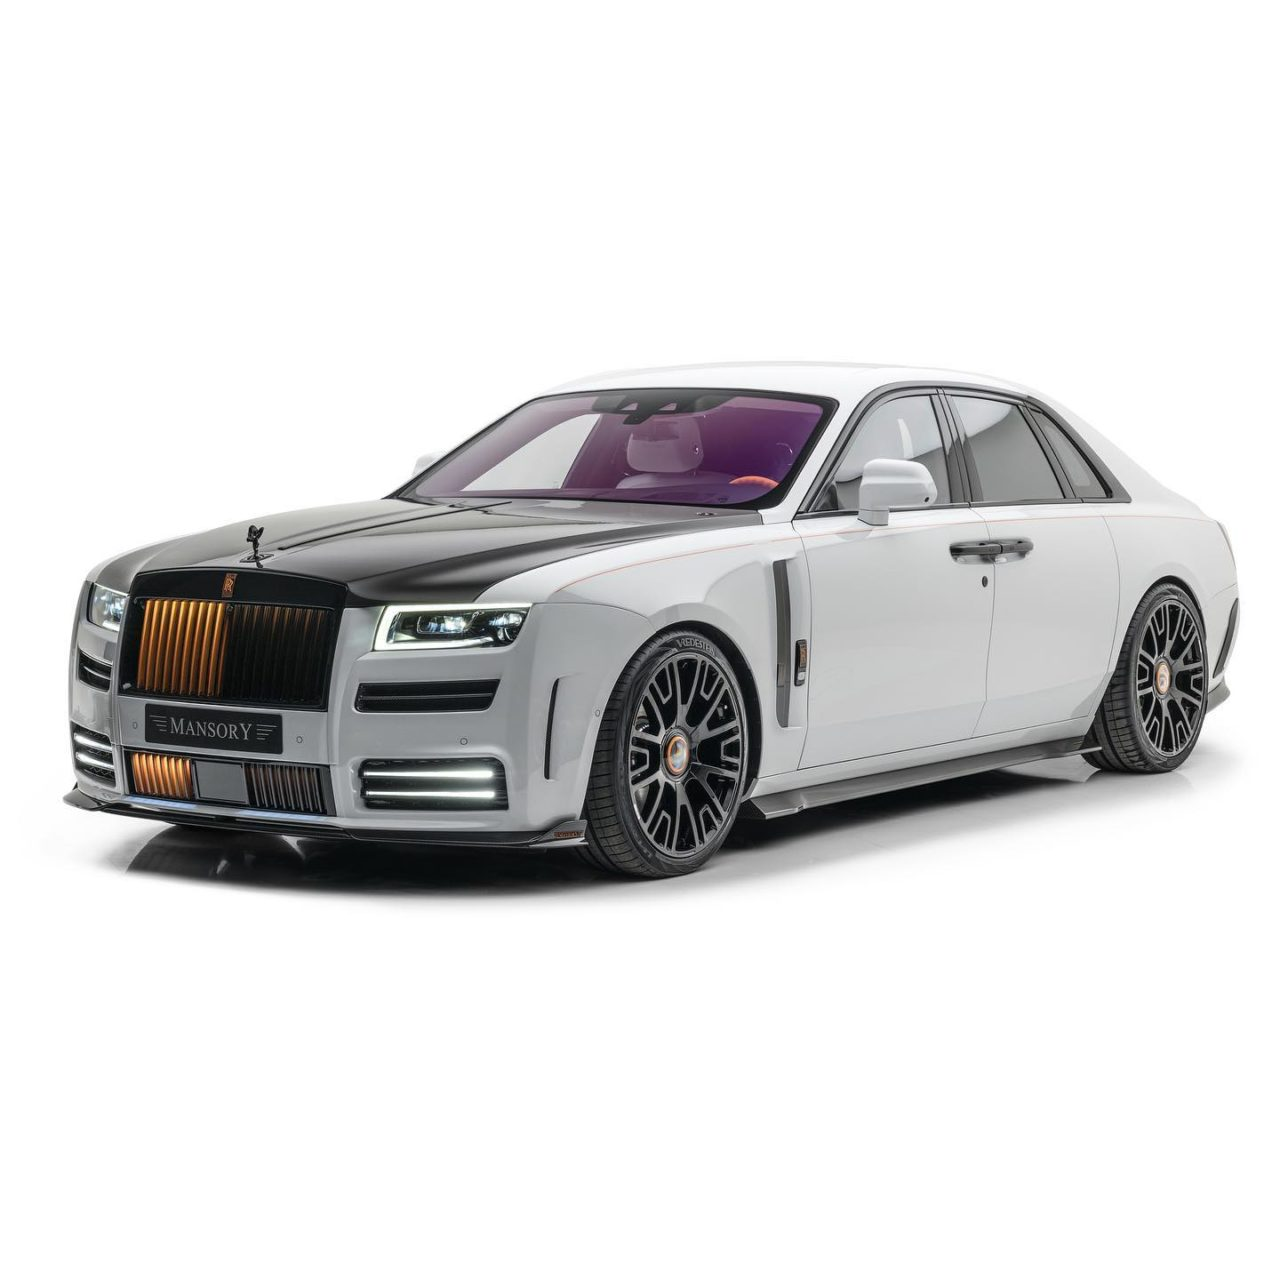 Mansory-Rolls-Royce-Ghost-7-1280x1280.jpg